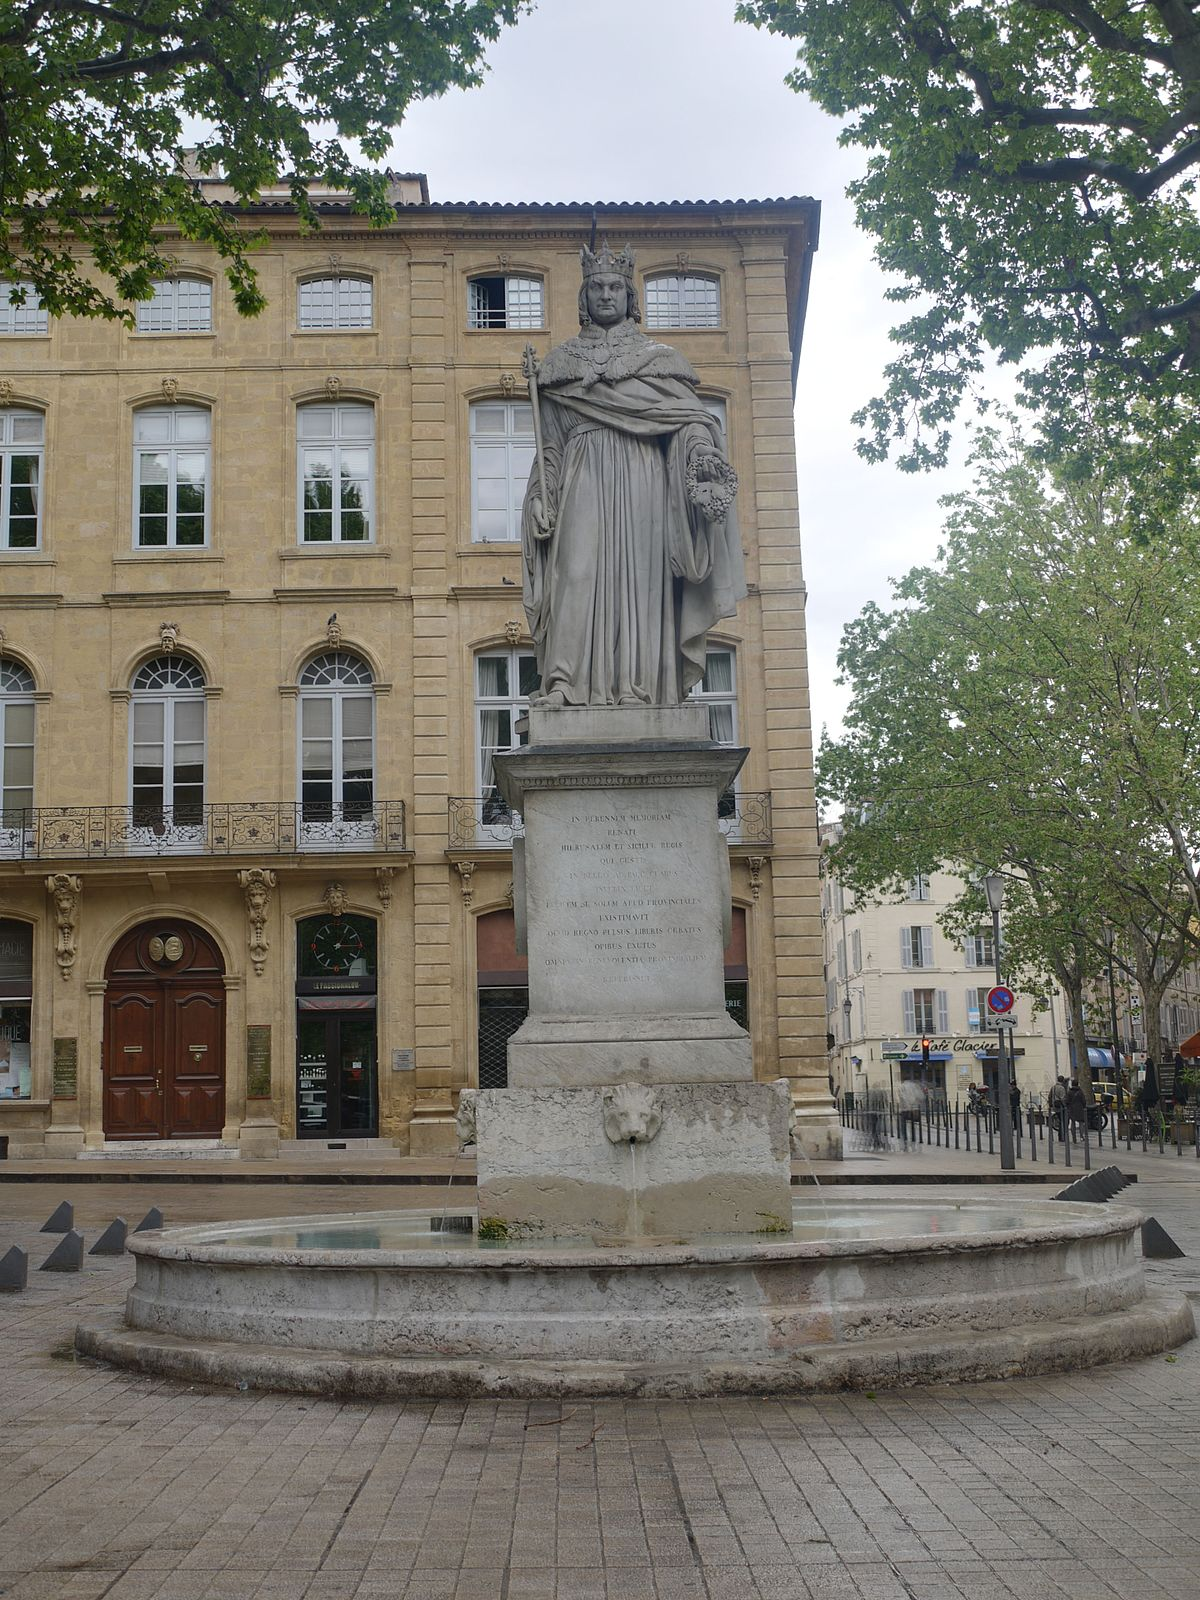 Fontaine du roi ren wikipedia for Hotels 2 etoiles aix en provence